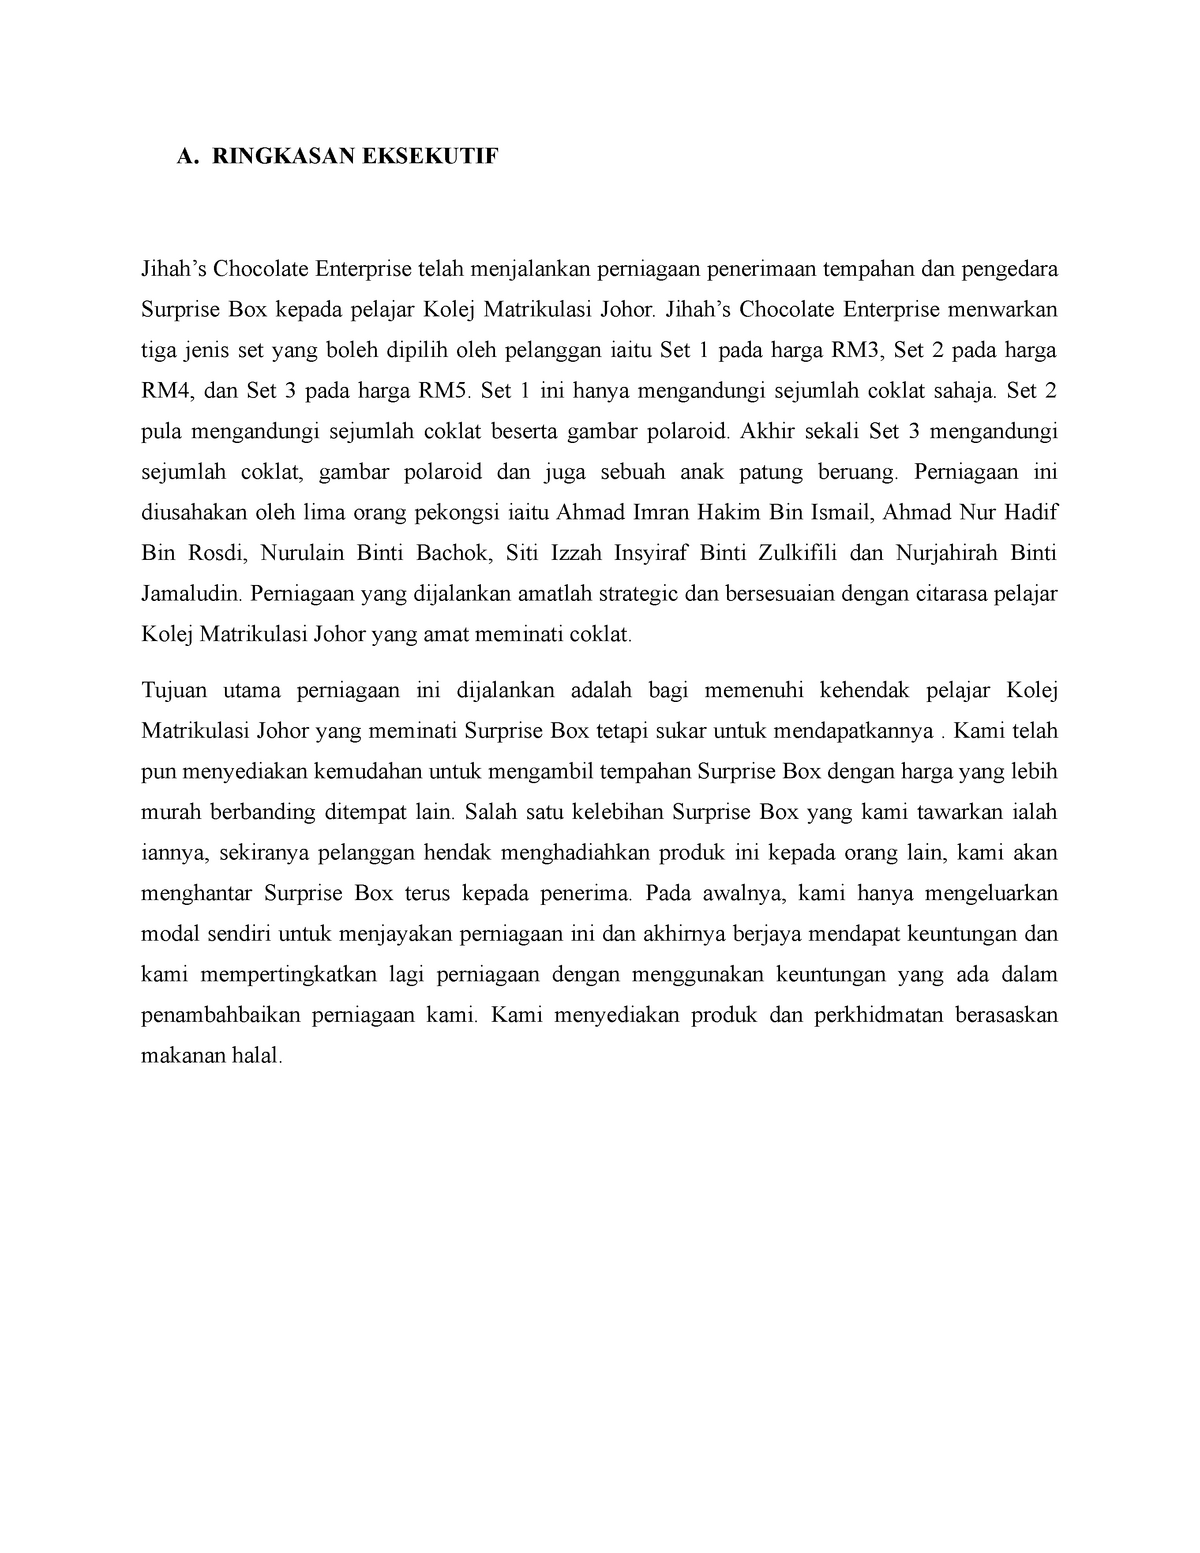 Ringkasan Eksekutif Executive Summary Malay Ringkasan Eksekutif Jihah Studocu